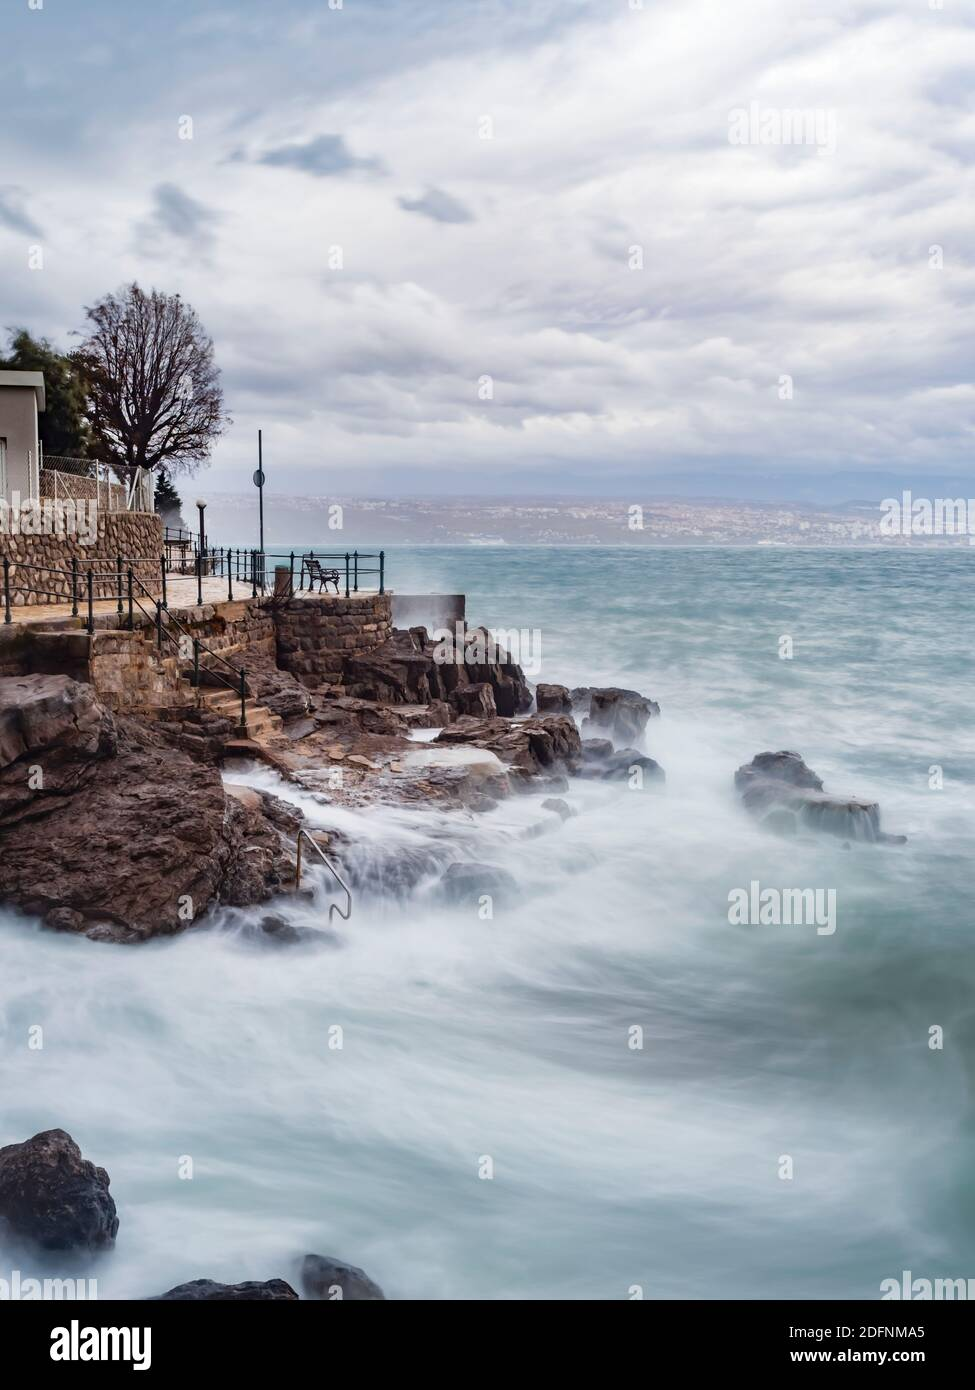 Arty aka artistic view milky smooth surface long exposure severe stormy storm sea waves Lovran rocky rocks coastline Croatia Stock Photo